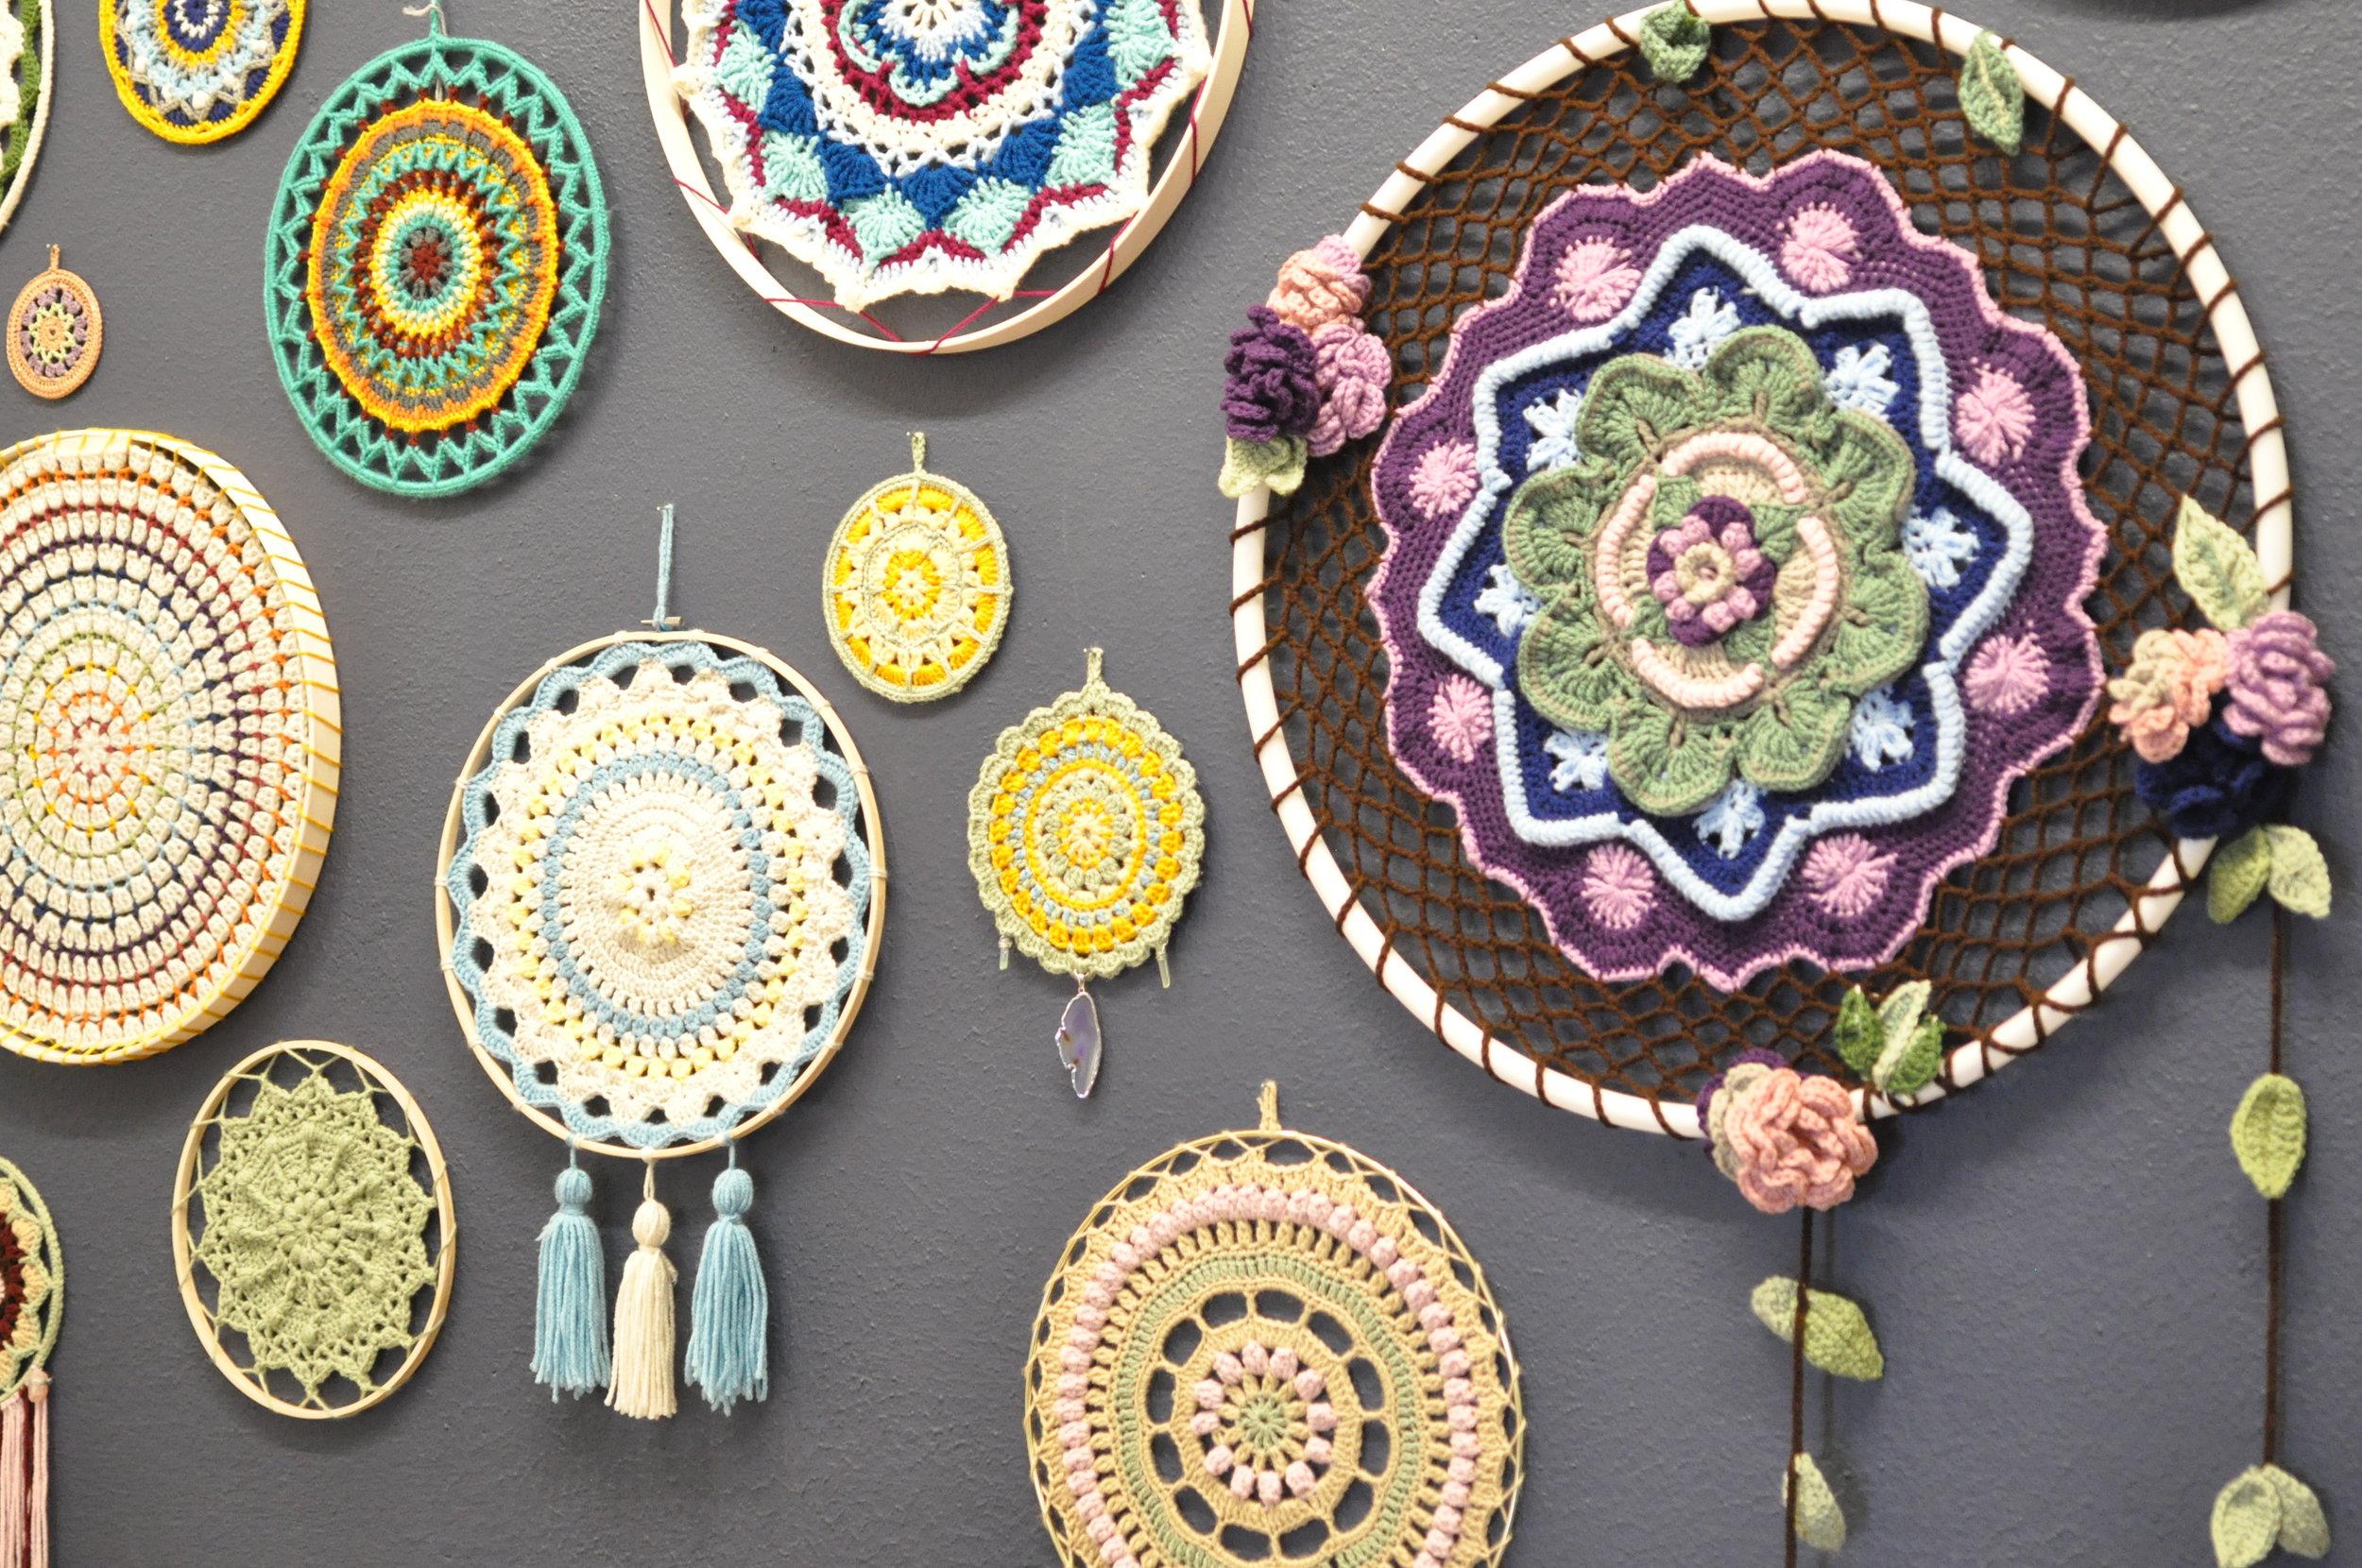 Earth Lotus Arts crochet mandalas up on the Indigo Wall